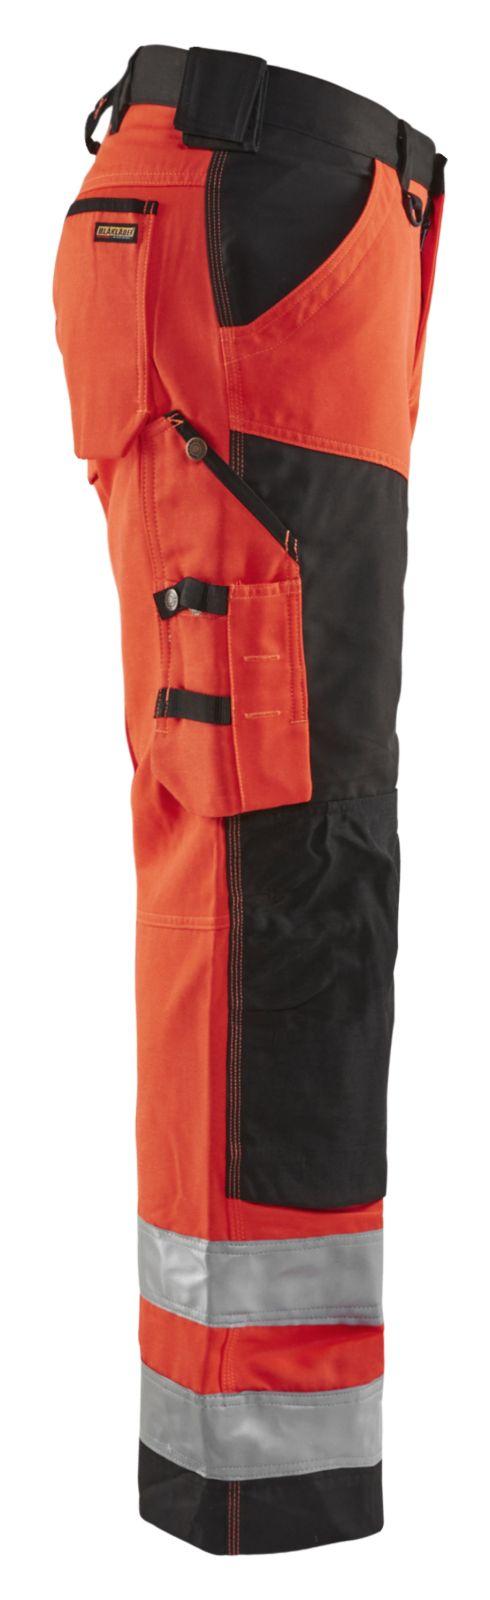 Blaklader Werkbroeken 15661811 High Vis fluor rood-zwart(5599)